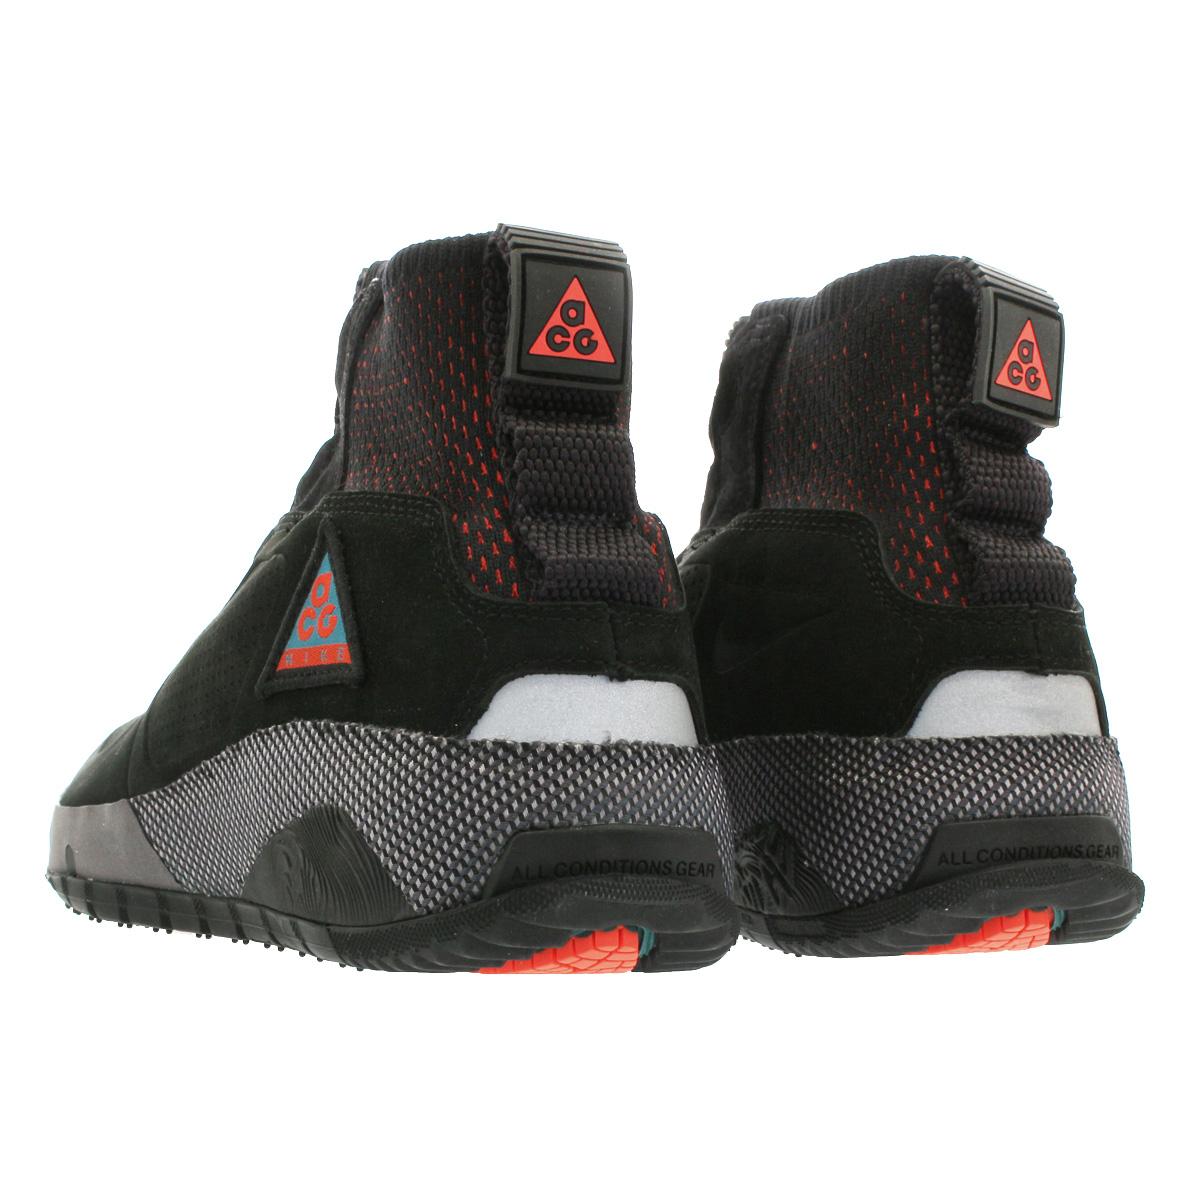 huge discount cb025 7a1bd NIKE ACG RUCKEL RIDGE Nike ACG ラックルリッジ BLACK GEODE TEAL HABANERO RED  aq9333-002